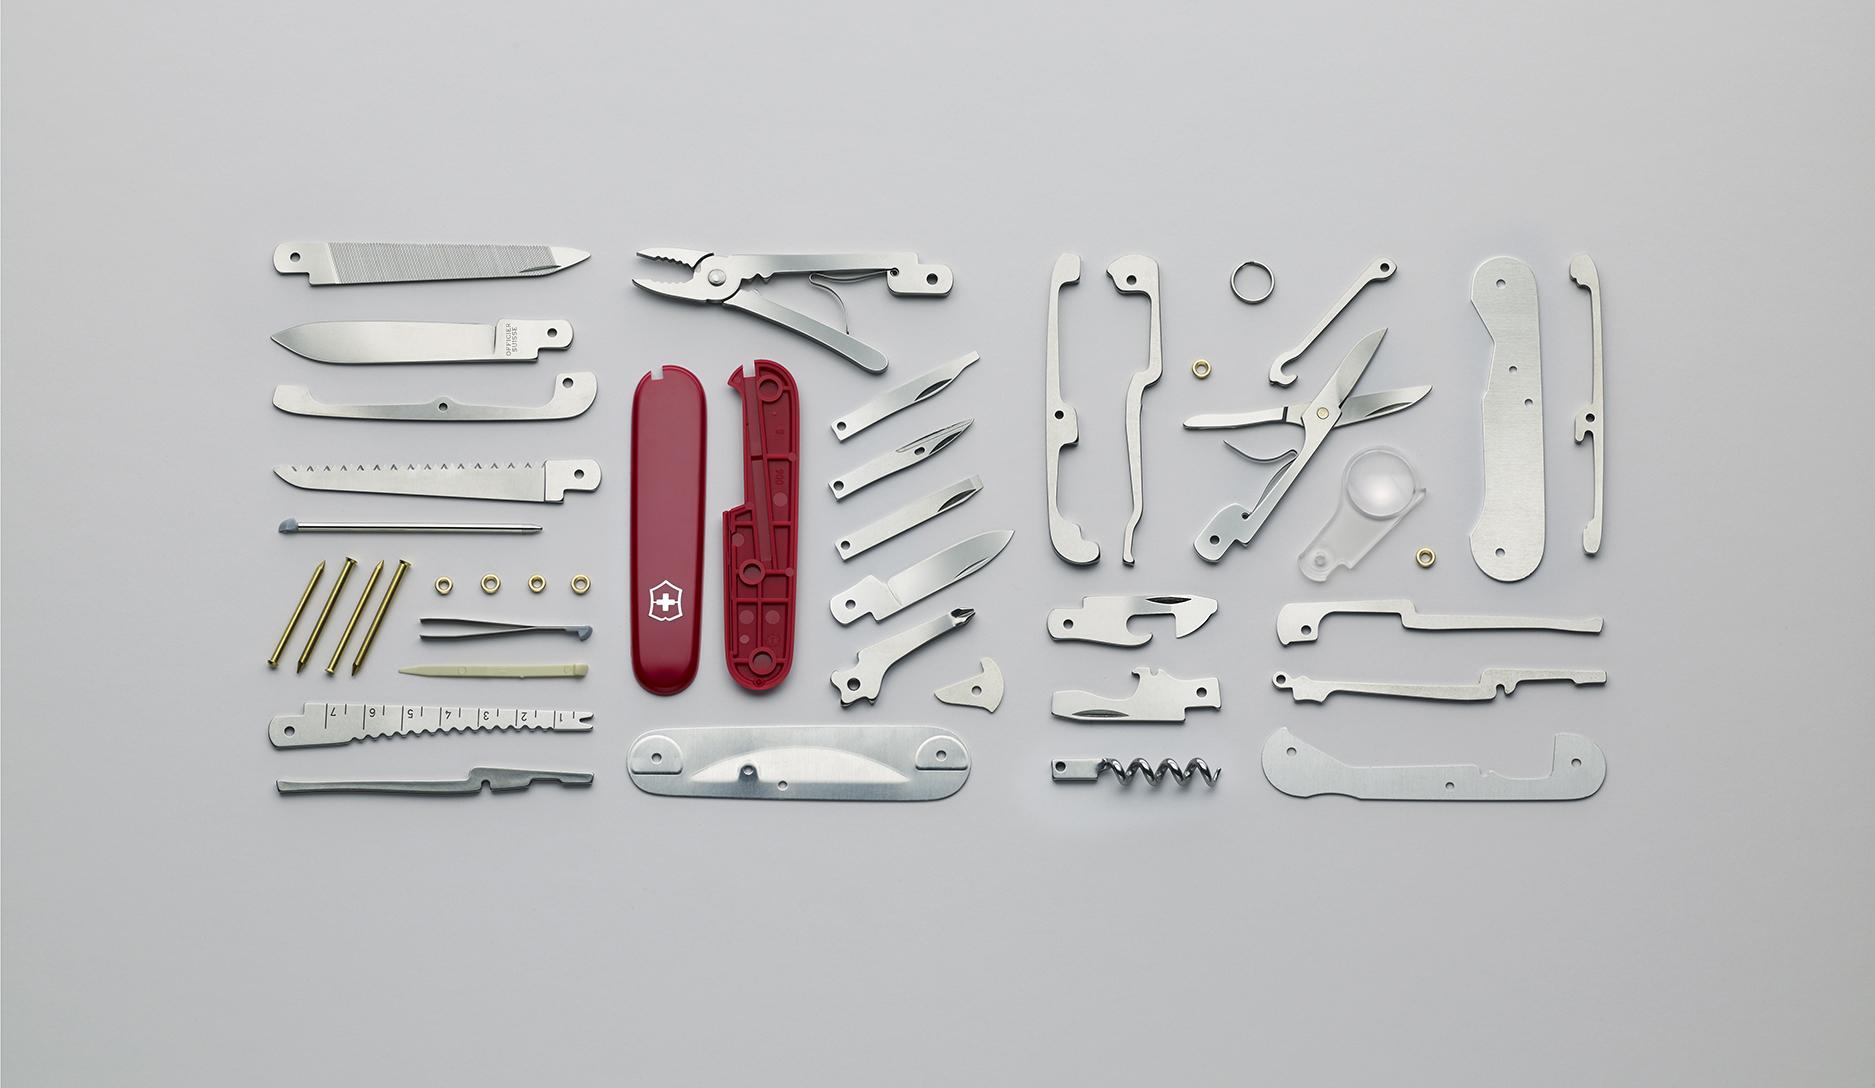 swiss-army-knife.jpg